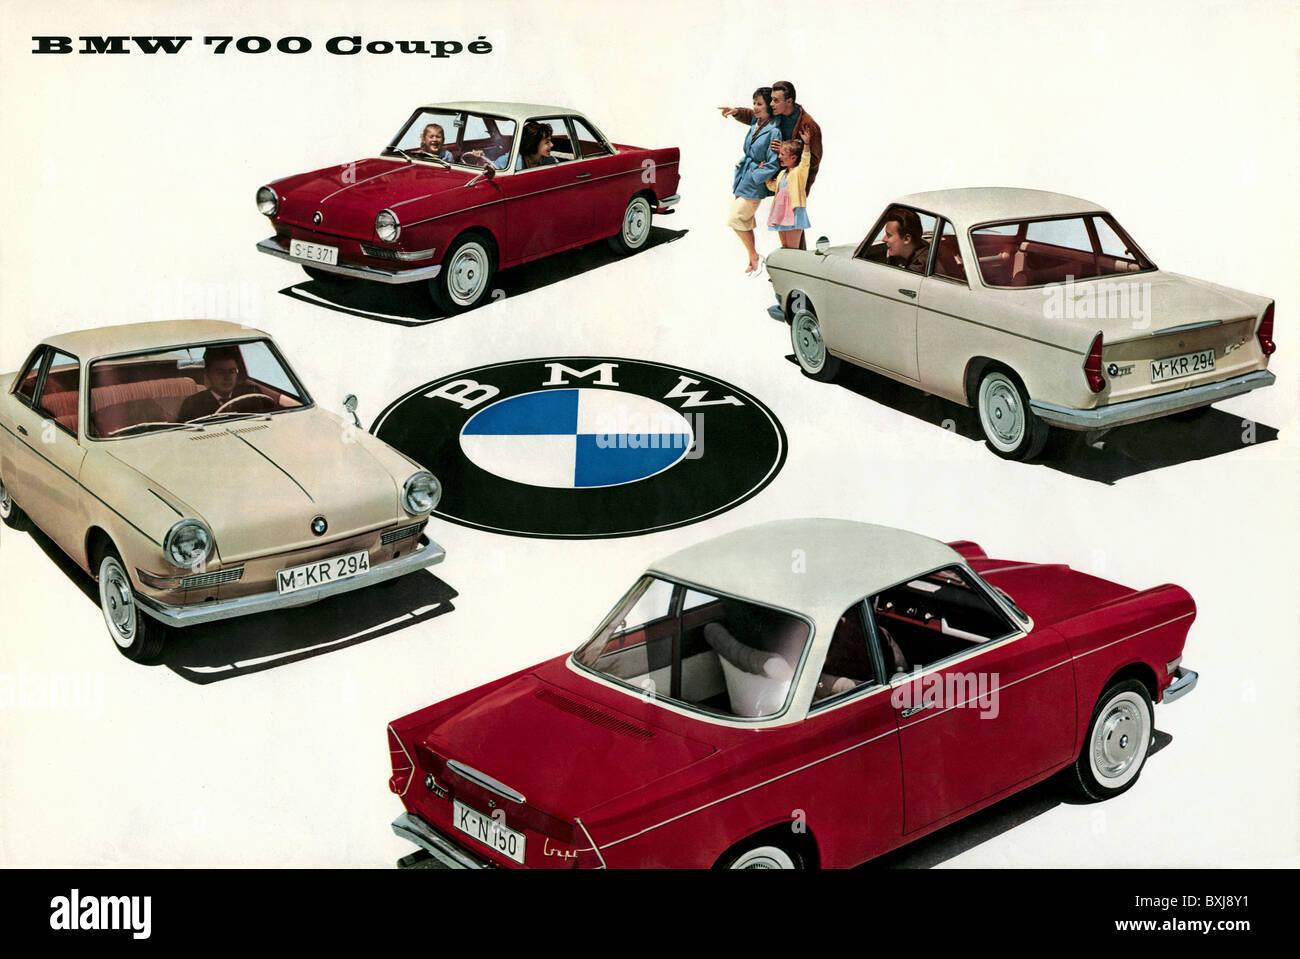 transport / transportation, car, vehicle variants, BMW 700 Coupe, build 1959 until 1964, advertising, Bavaria, Germany, - Stock Image